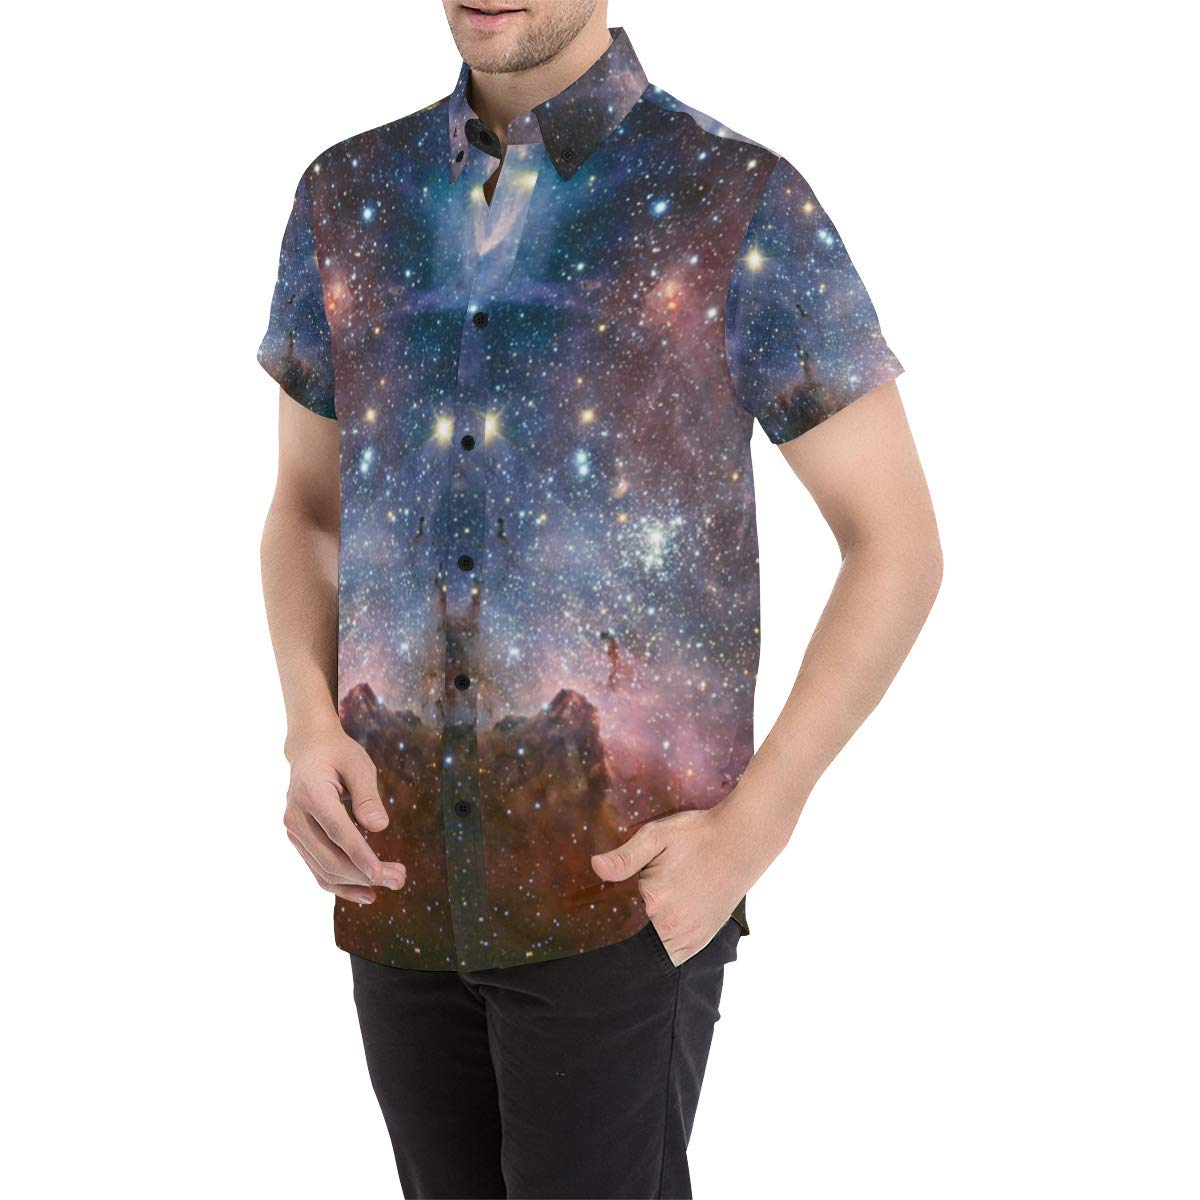 UlanLi Milky Way Mens All Over Print Short Sleeve Shirt//Large Size